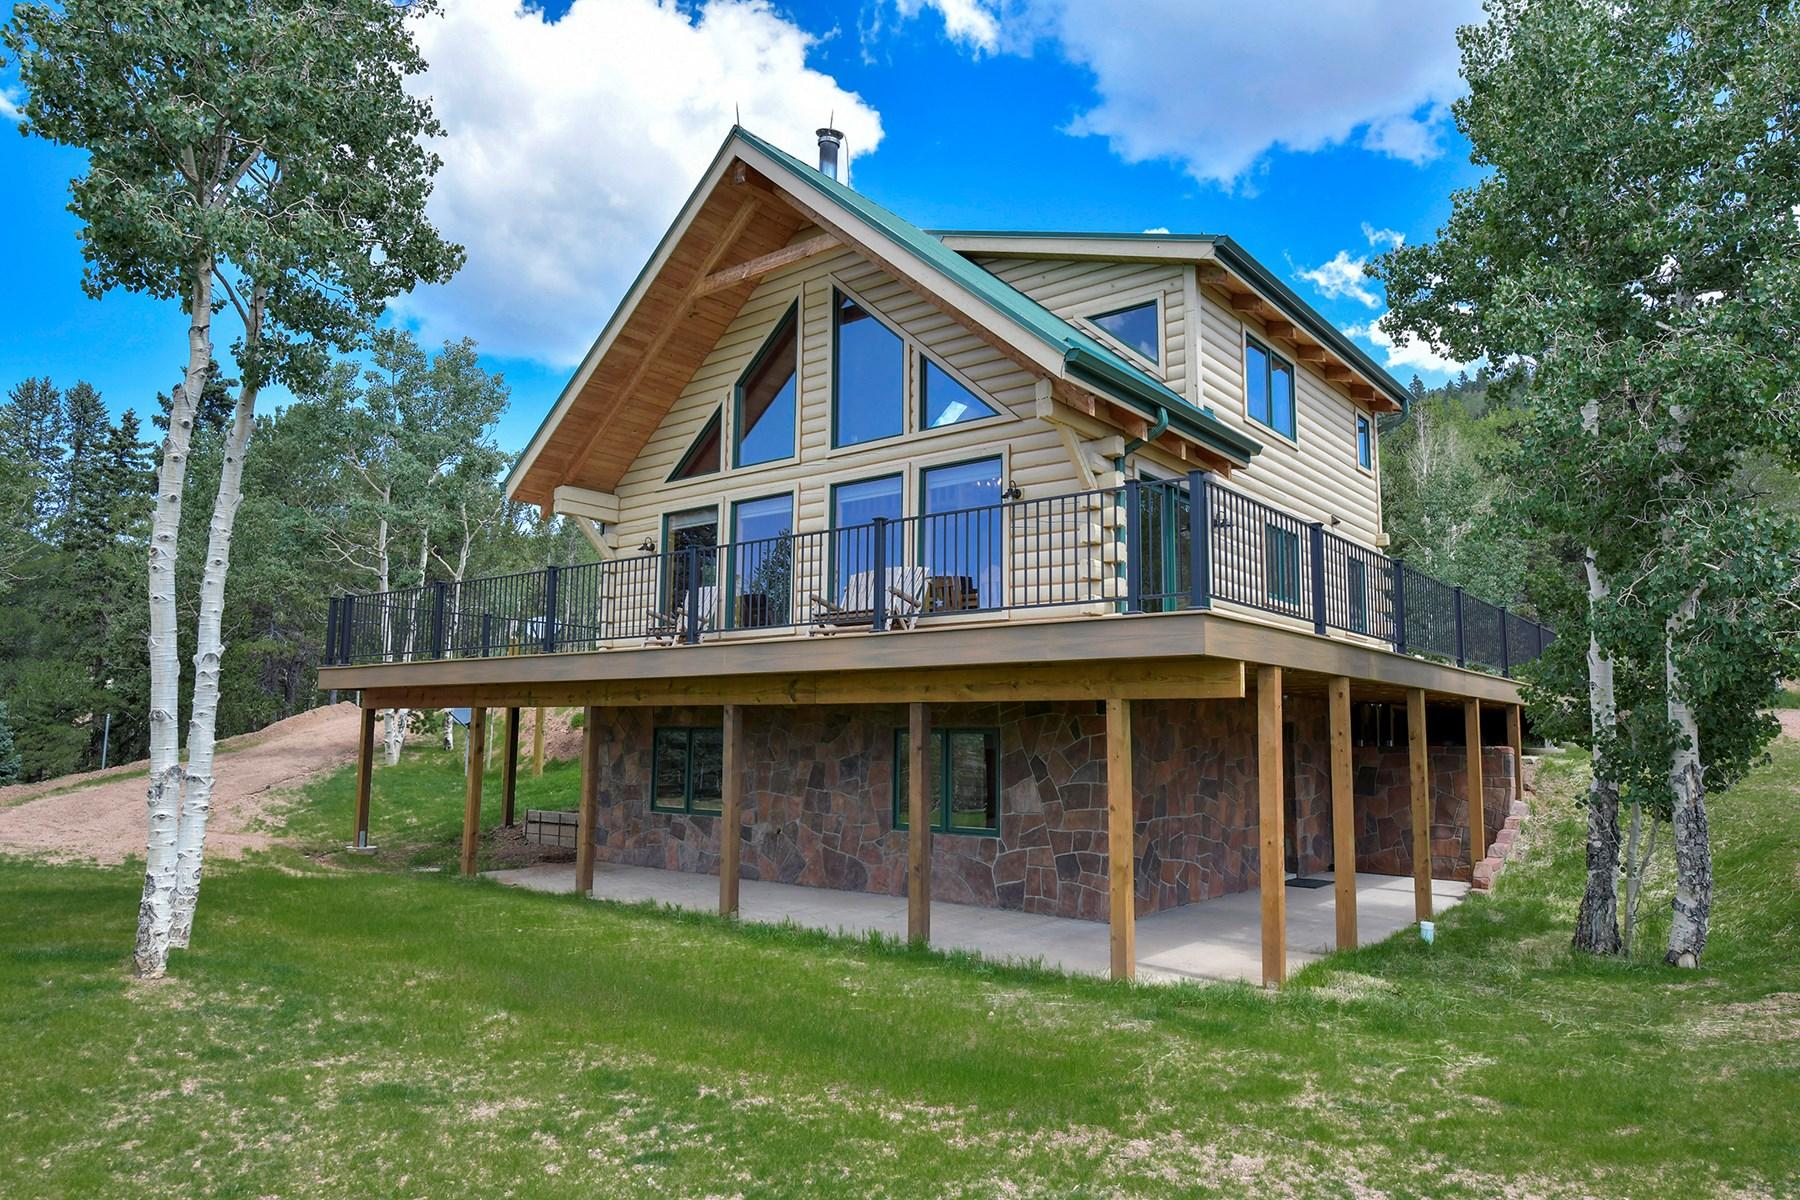 Log Home  - Extraordinary 35 acres in Central Colorado Mtns